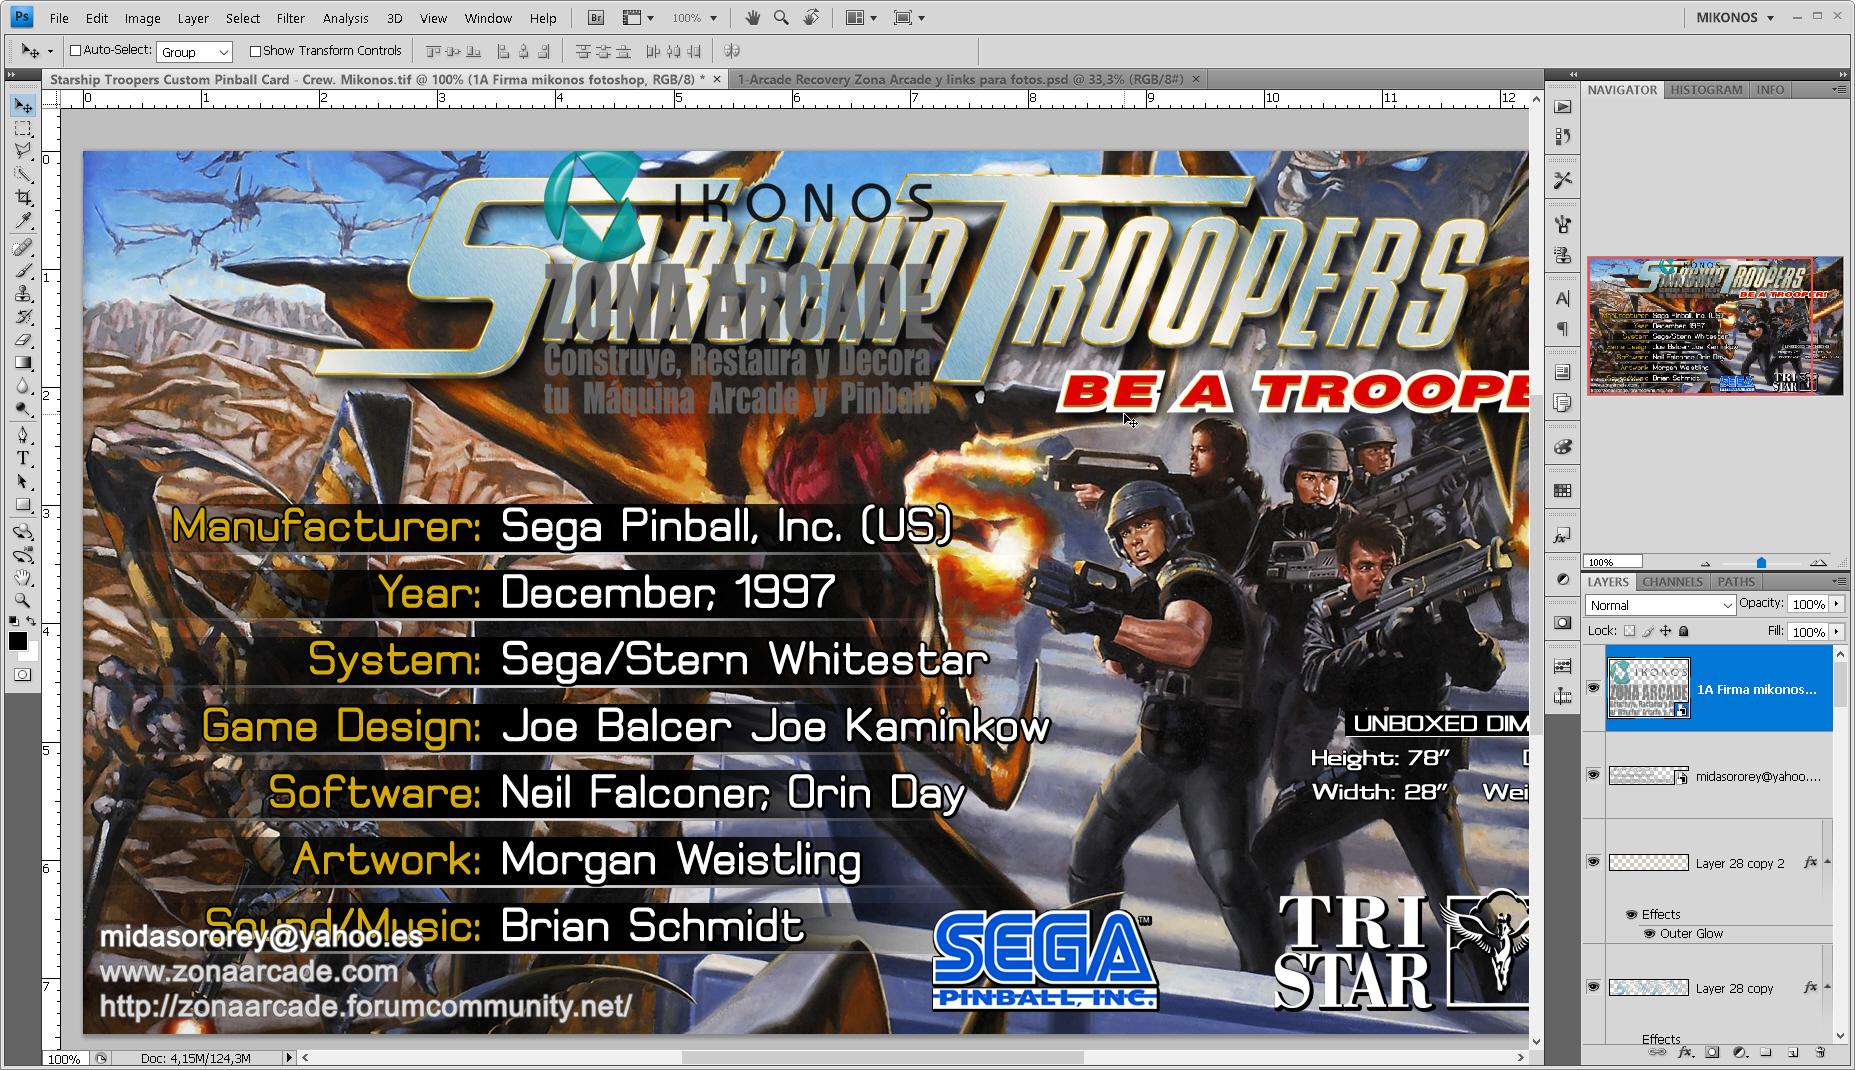 Starship%20Troopers%20Custom%20Pinball%20Card%20-%20Crew.%20Mikonos2.jpg